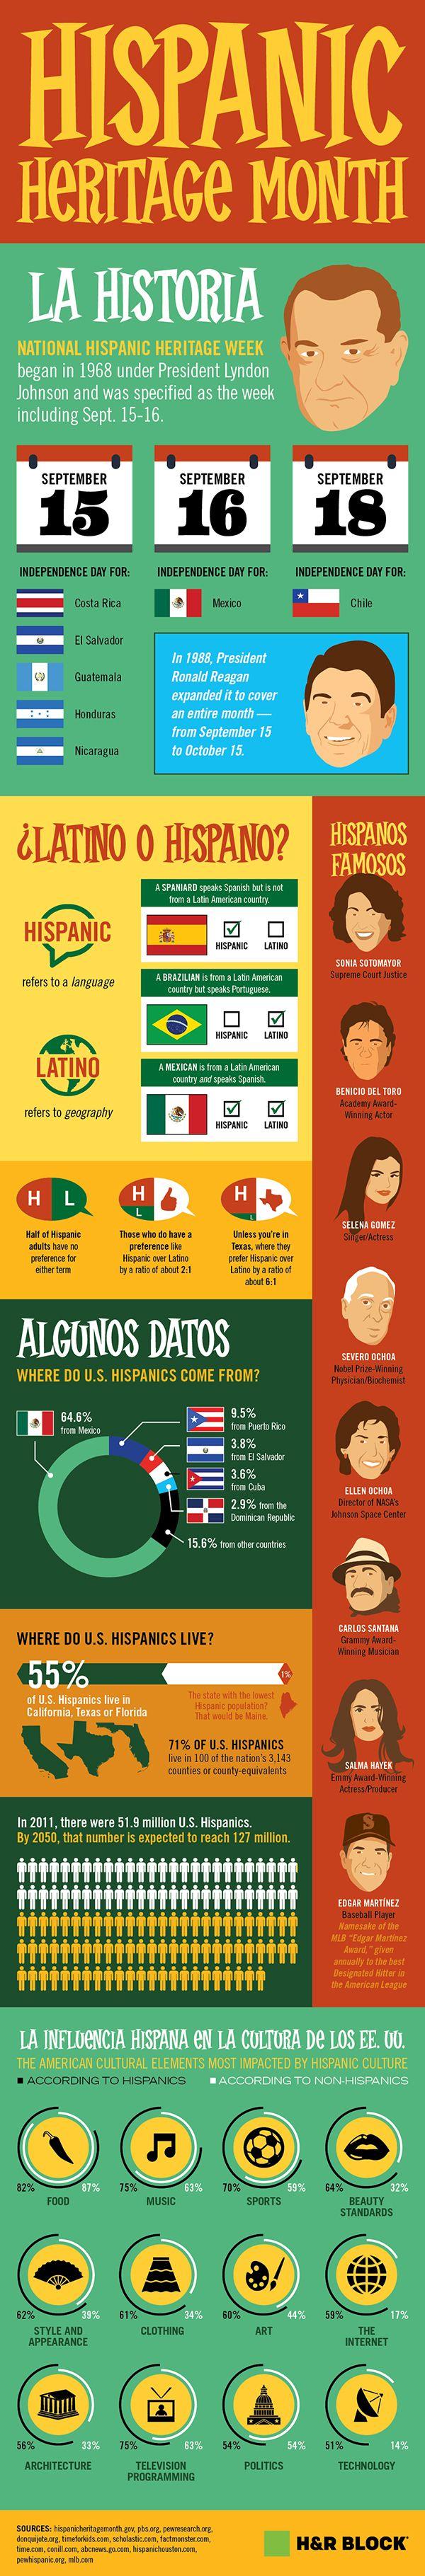 46 best Celebrations: El Mes de la herencia images on Pinterest ...